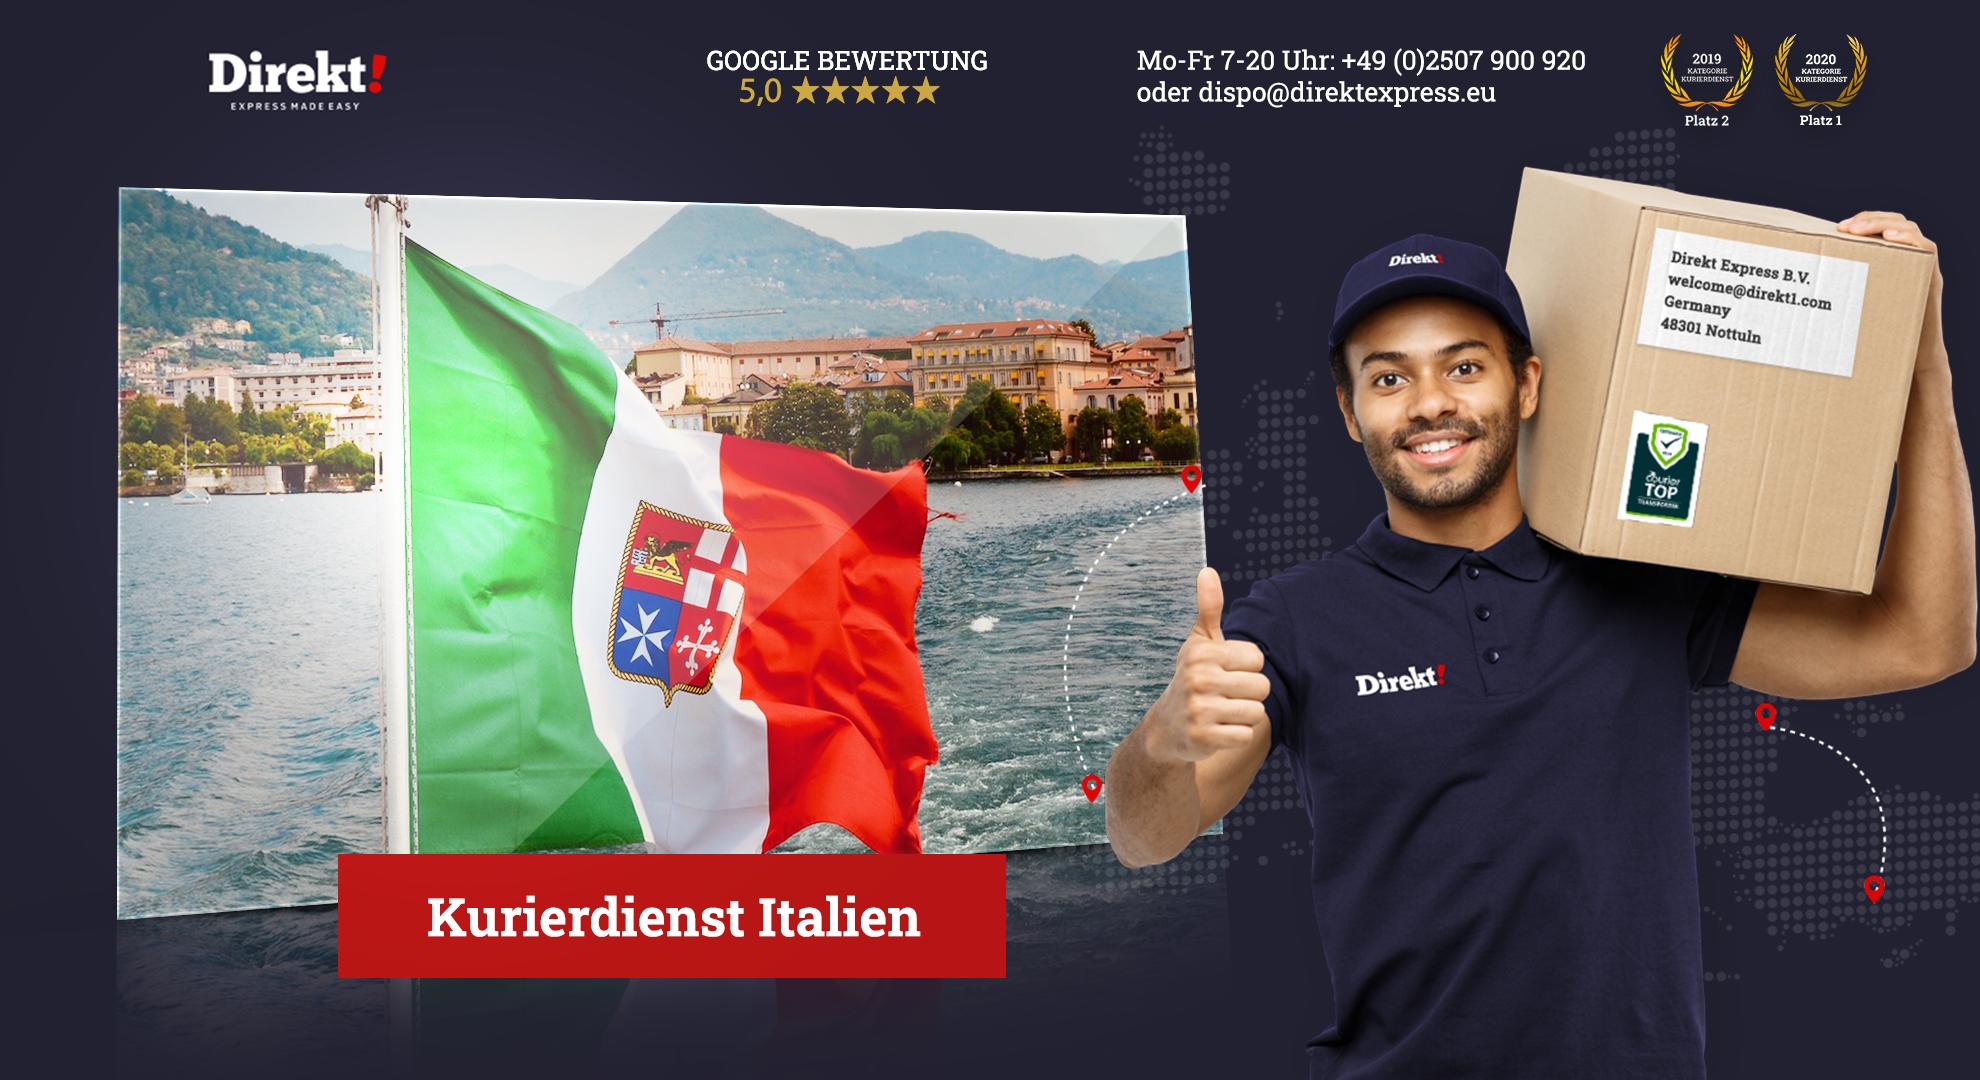 https://direkt1.com/wp-content/uploads/2021/03/Kurierdienst-italien-buchen.png